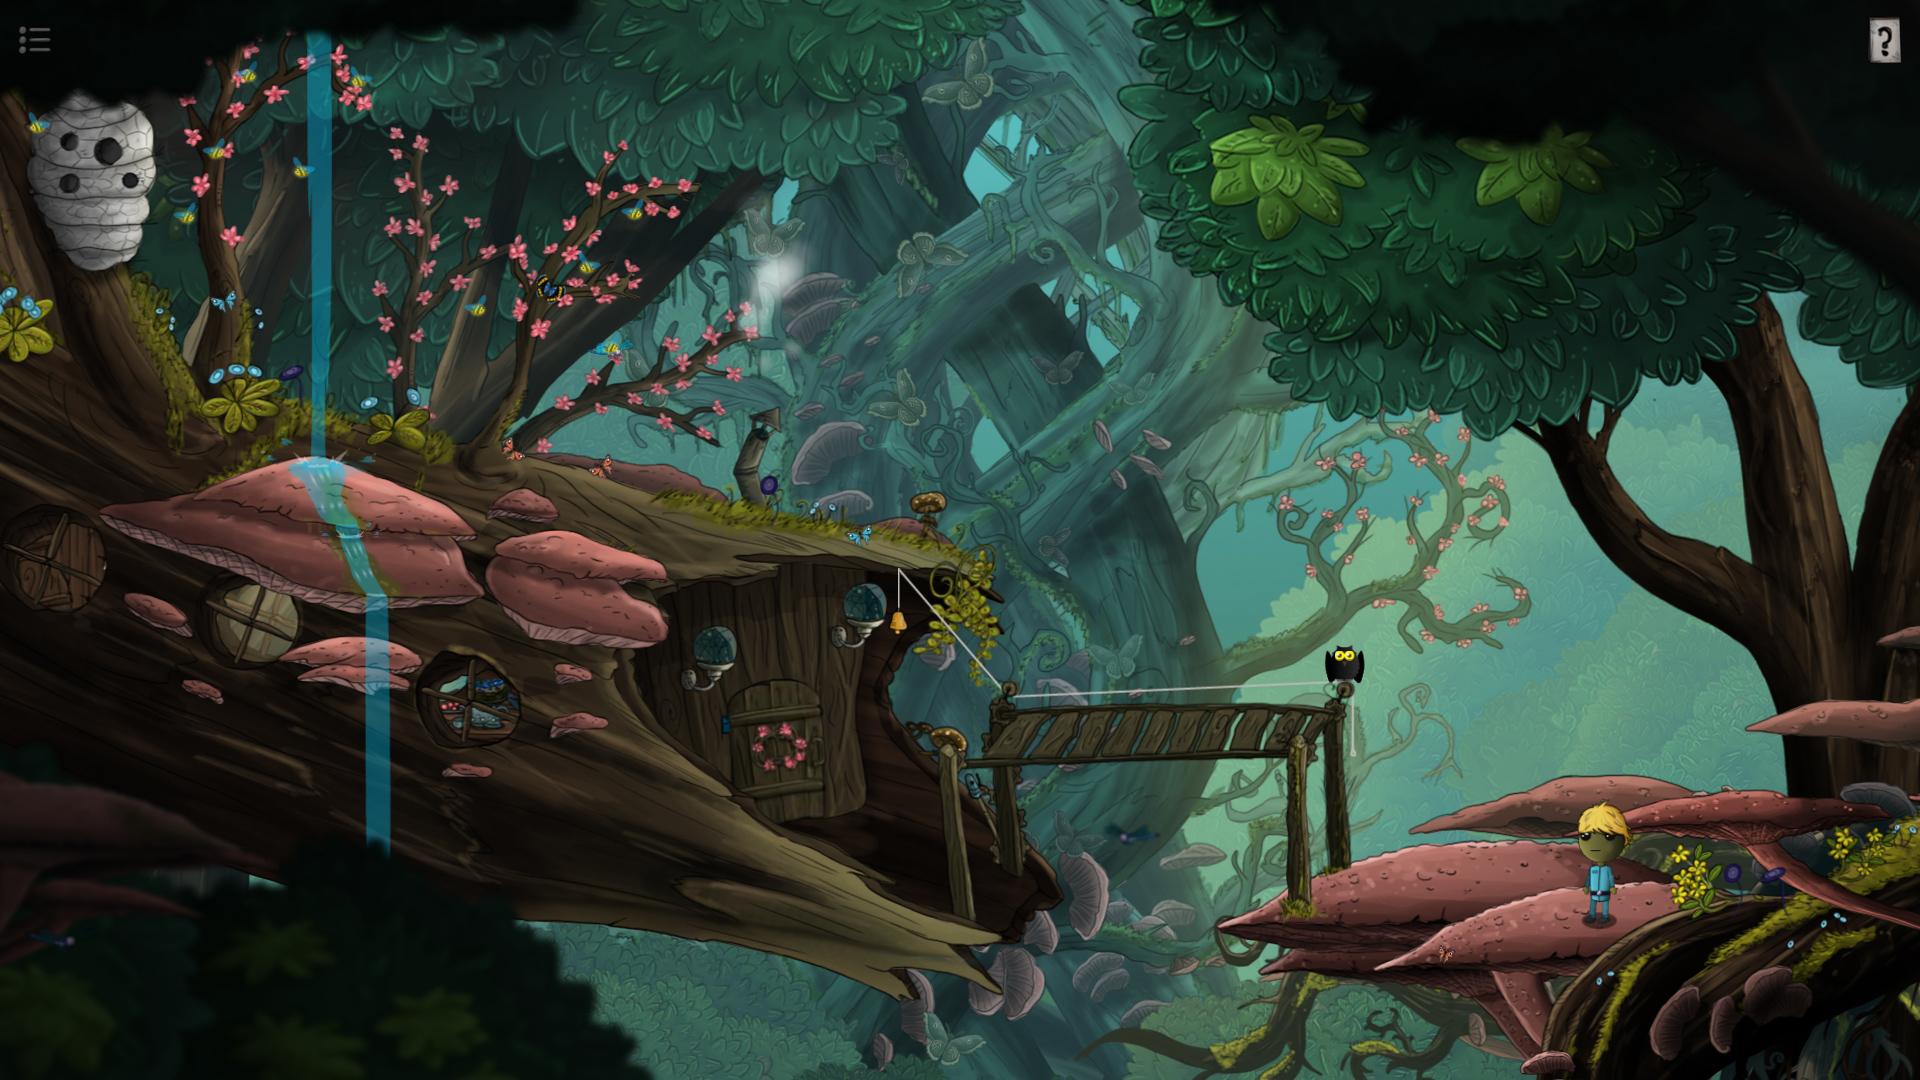 Shapik: the moon quest - screenshot #1 | Shapik: the moon quest[релиз]